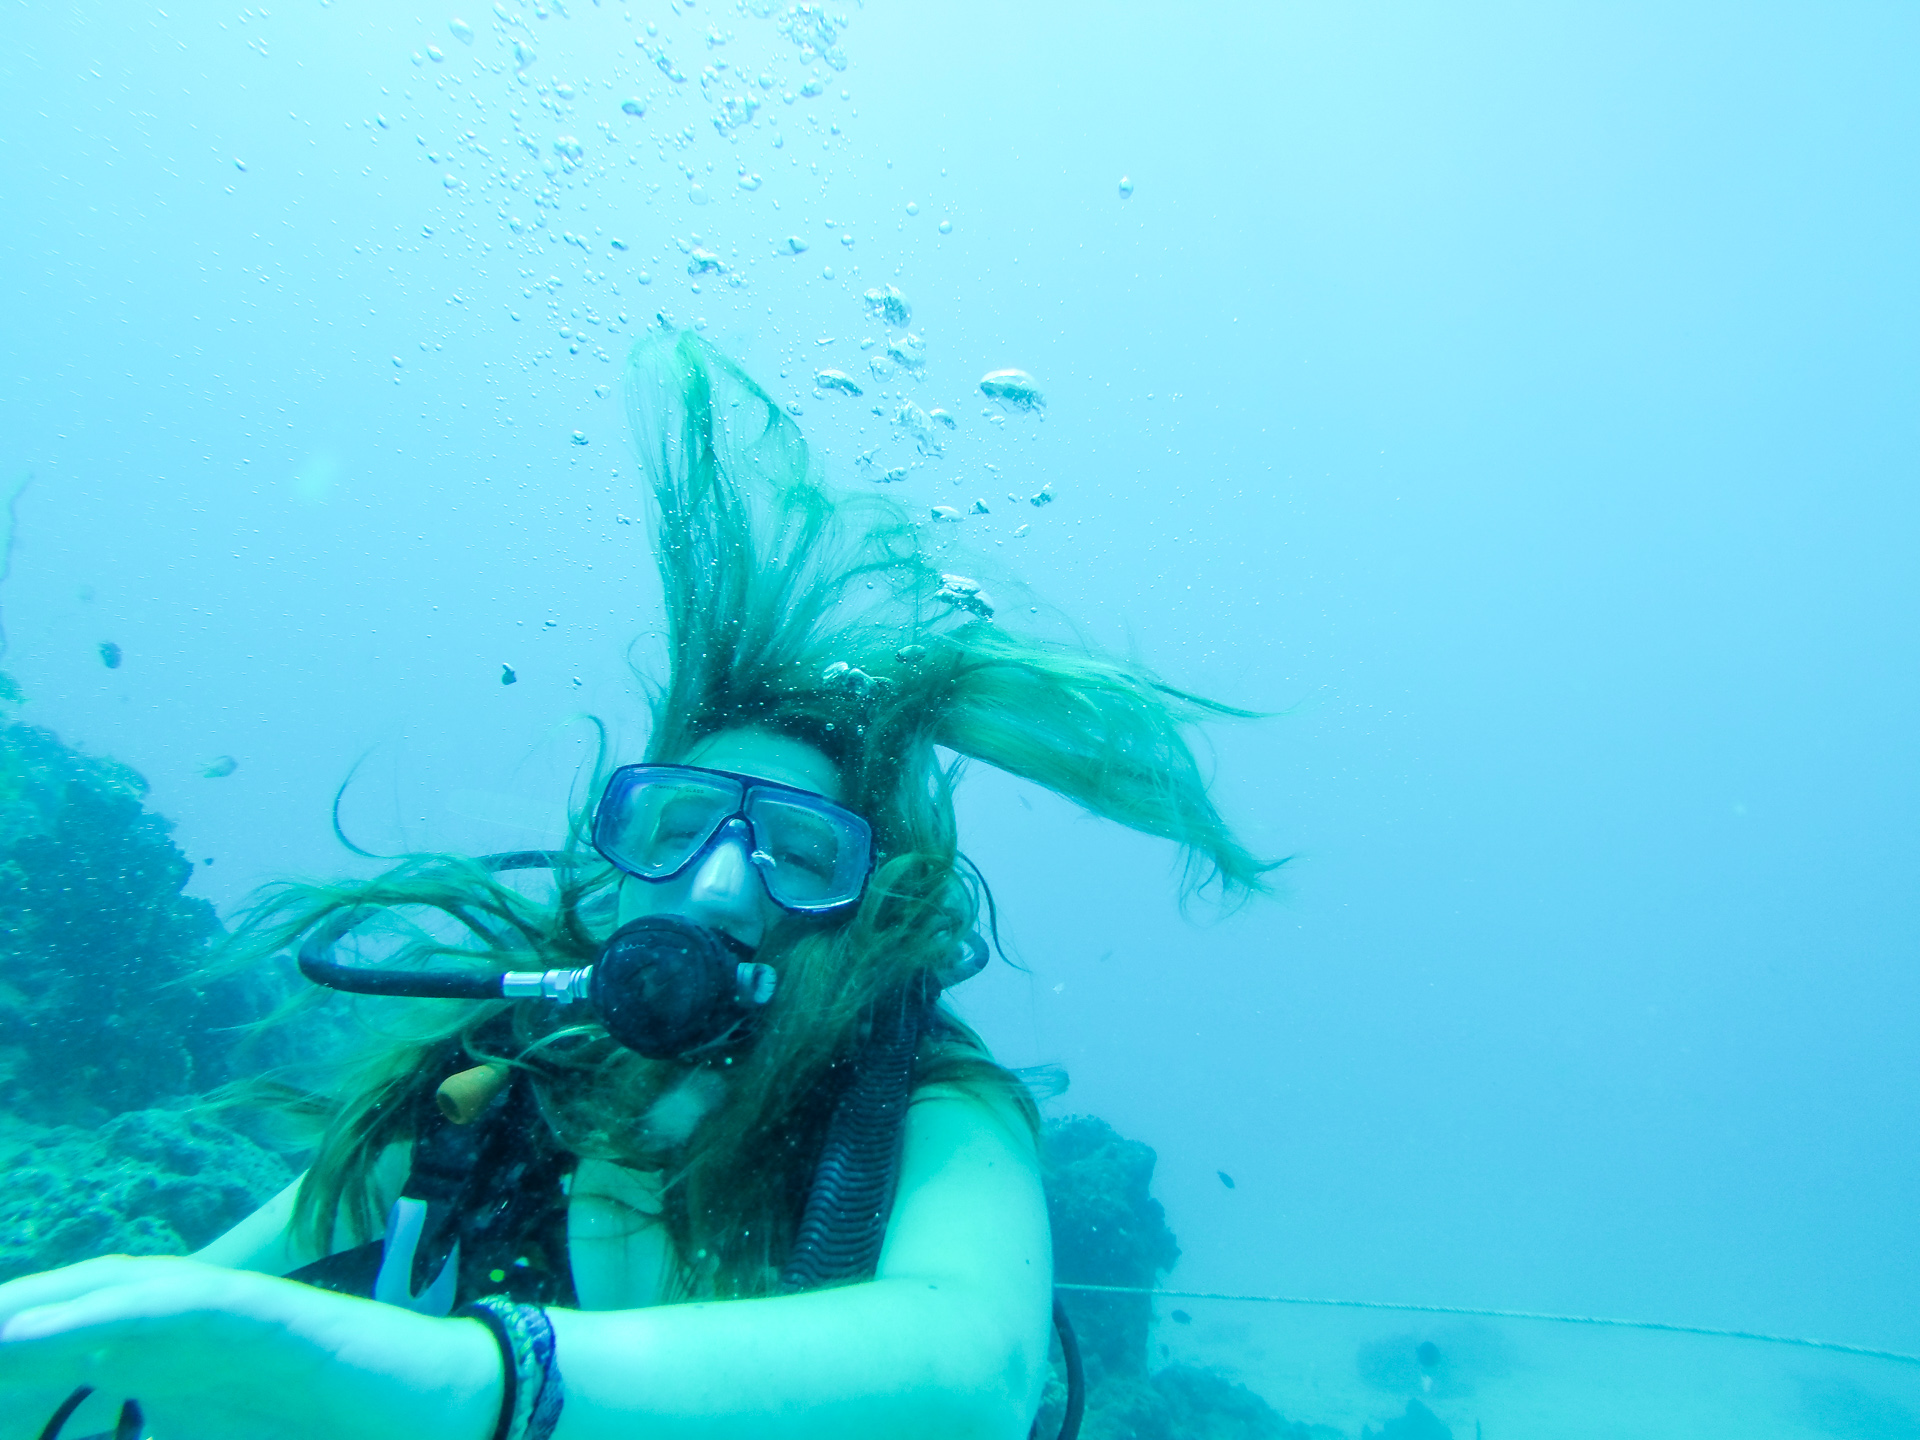 Alis laughing underwater diving waters of South Sea Island, Fiji